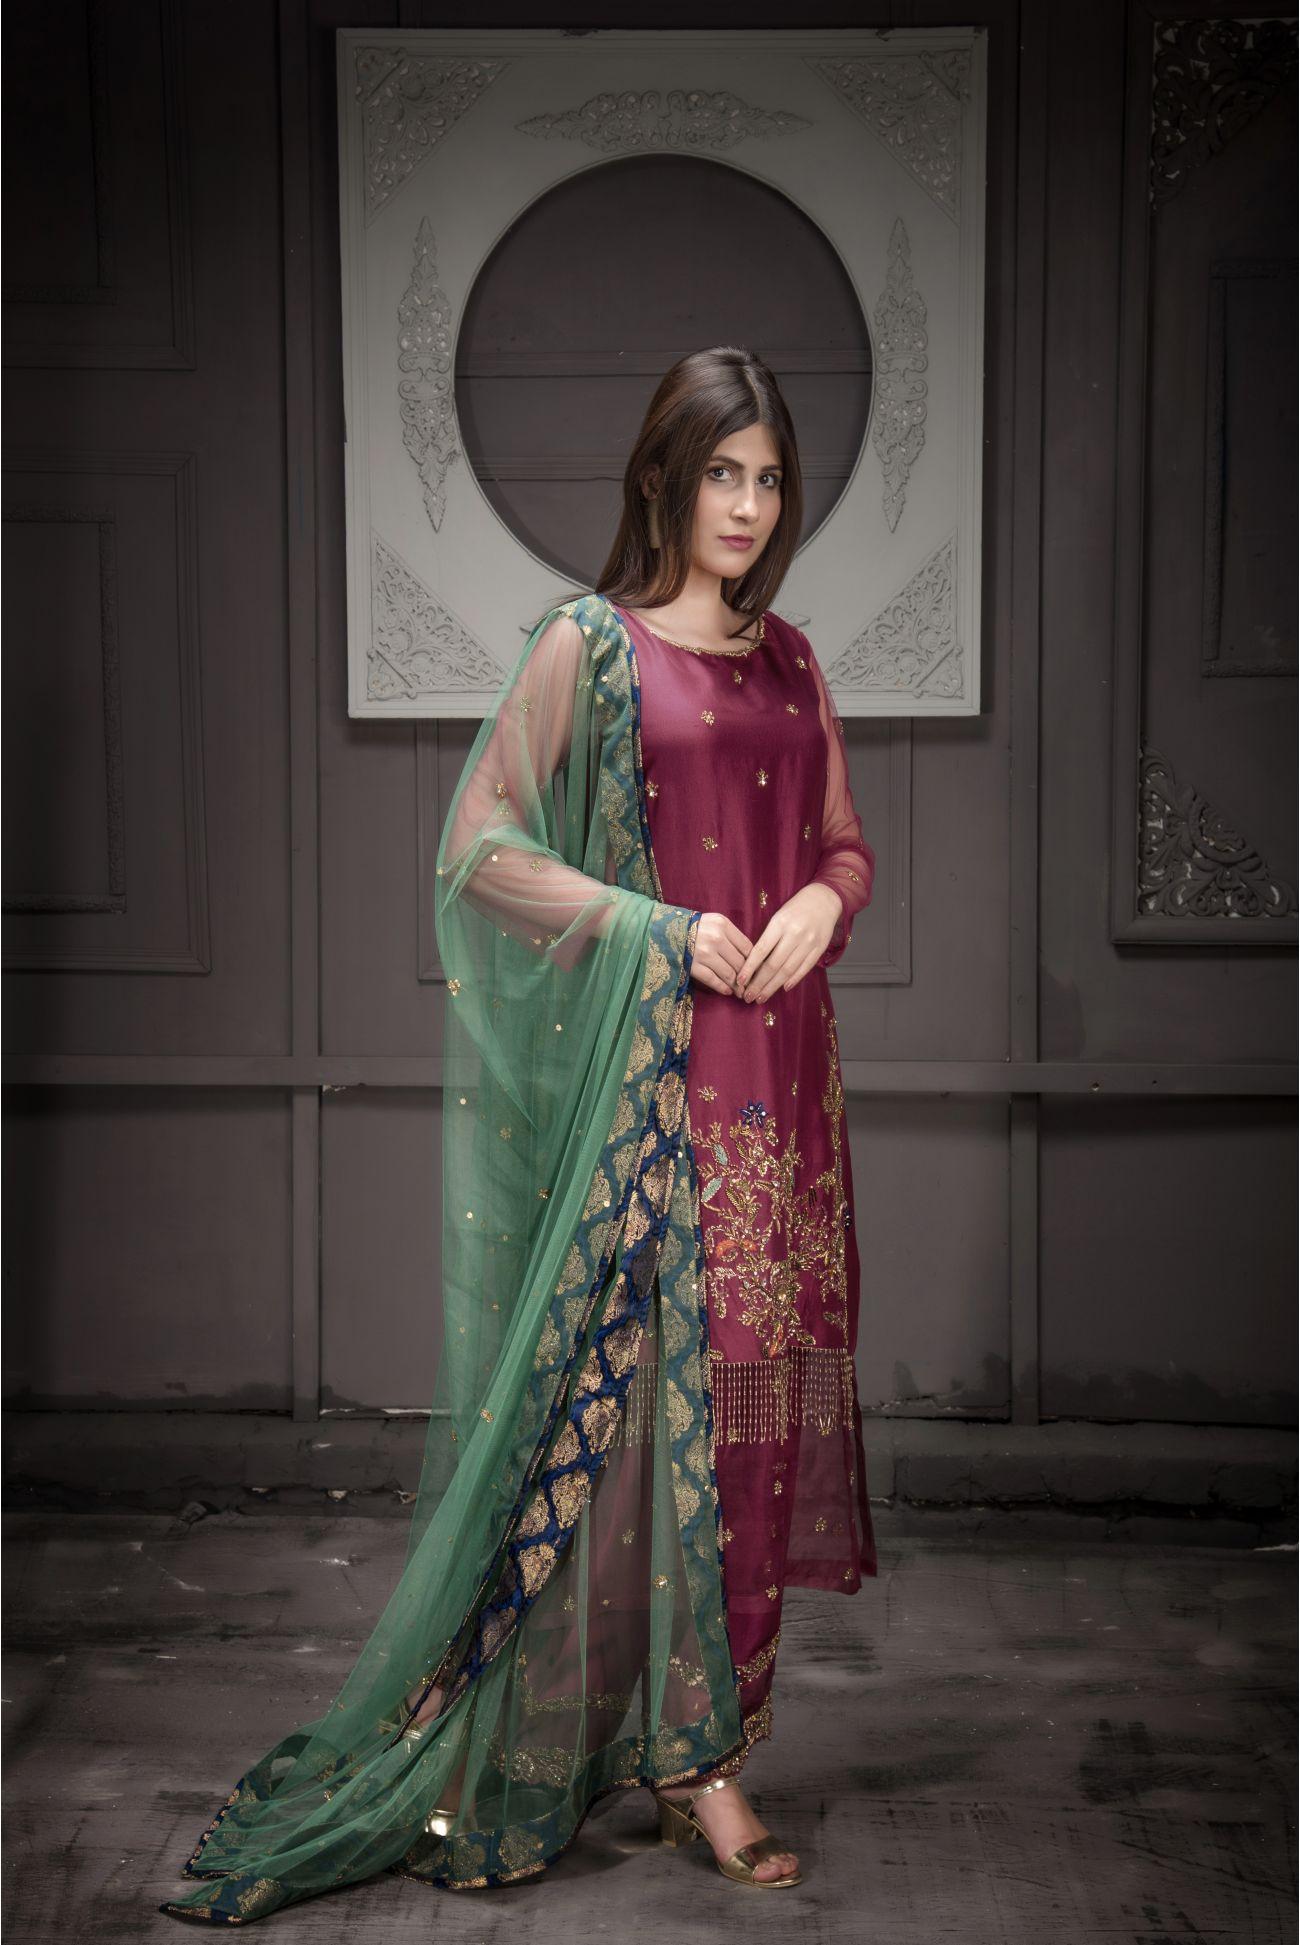 Buy Exclusive Malaga Bridal Wear – Aqbd12 Online In USA, Uk & Pakistan - 02